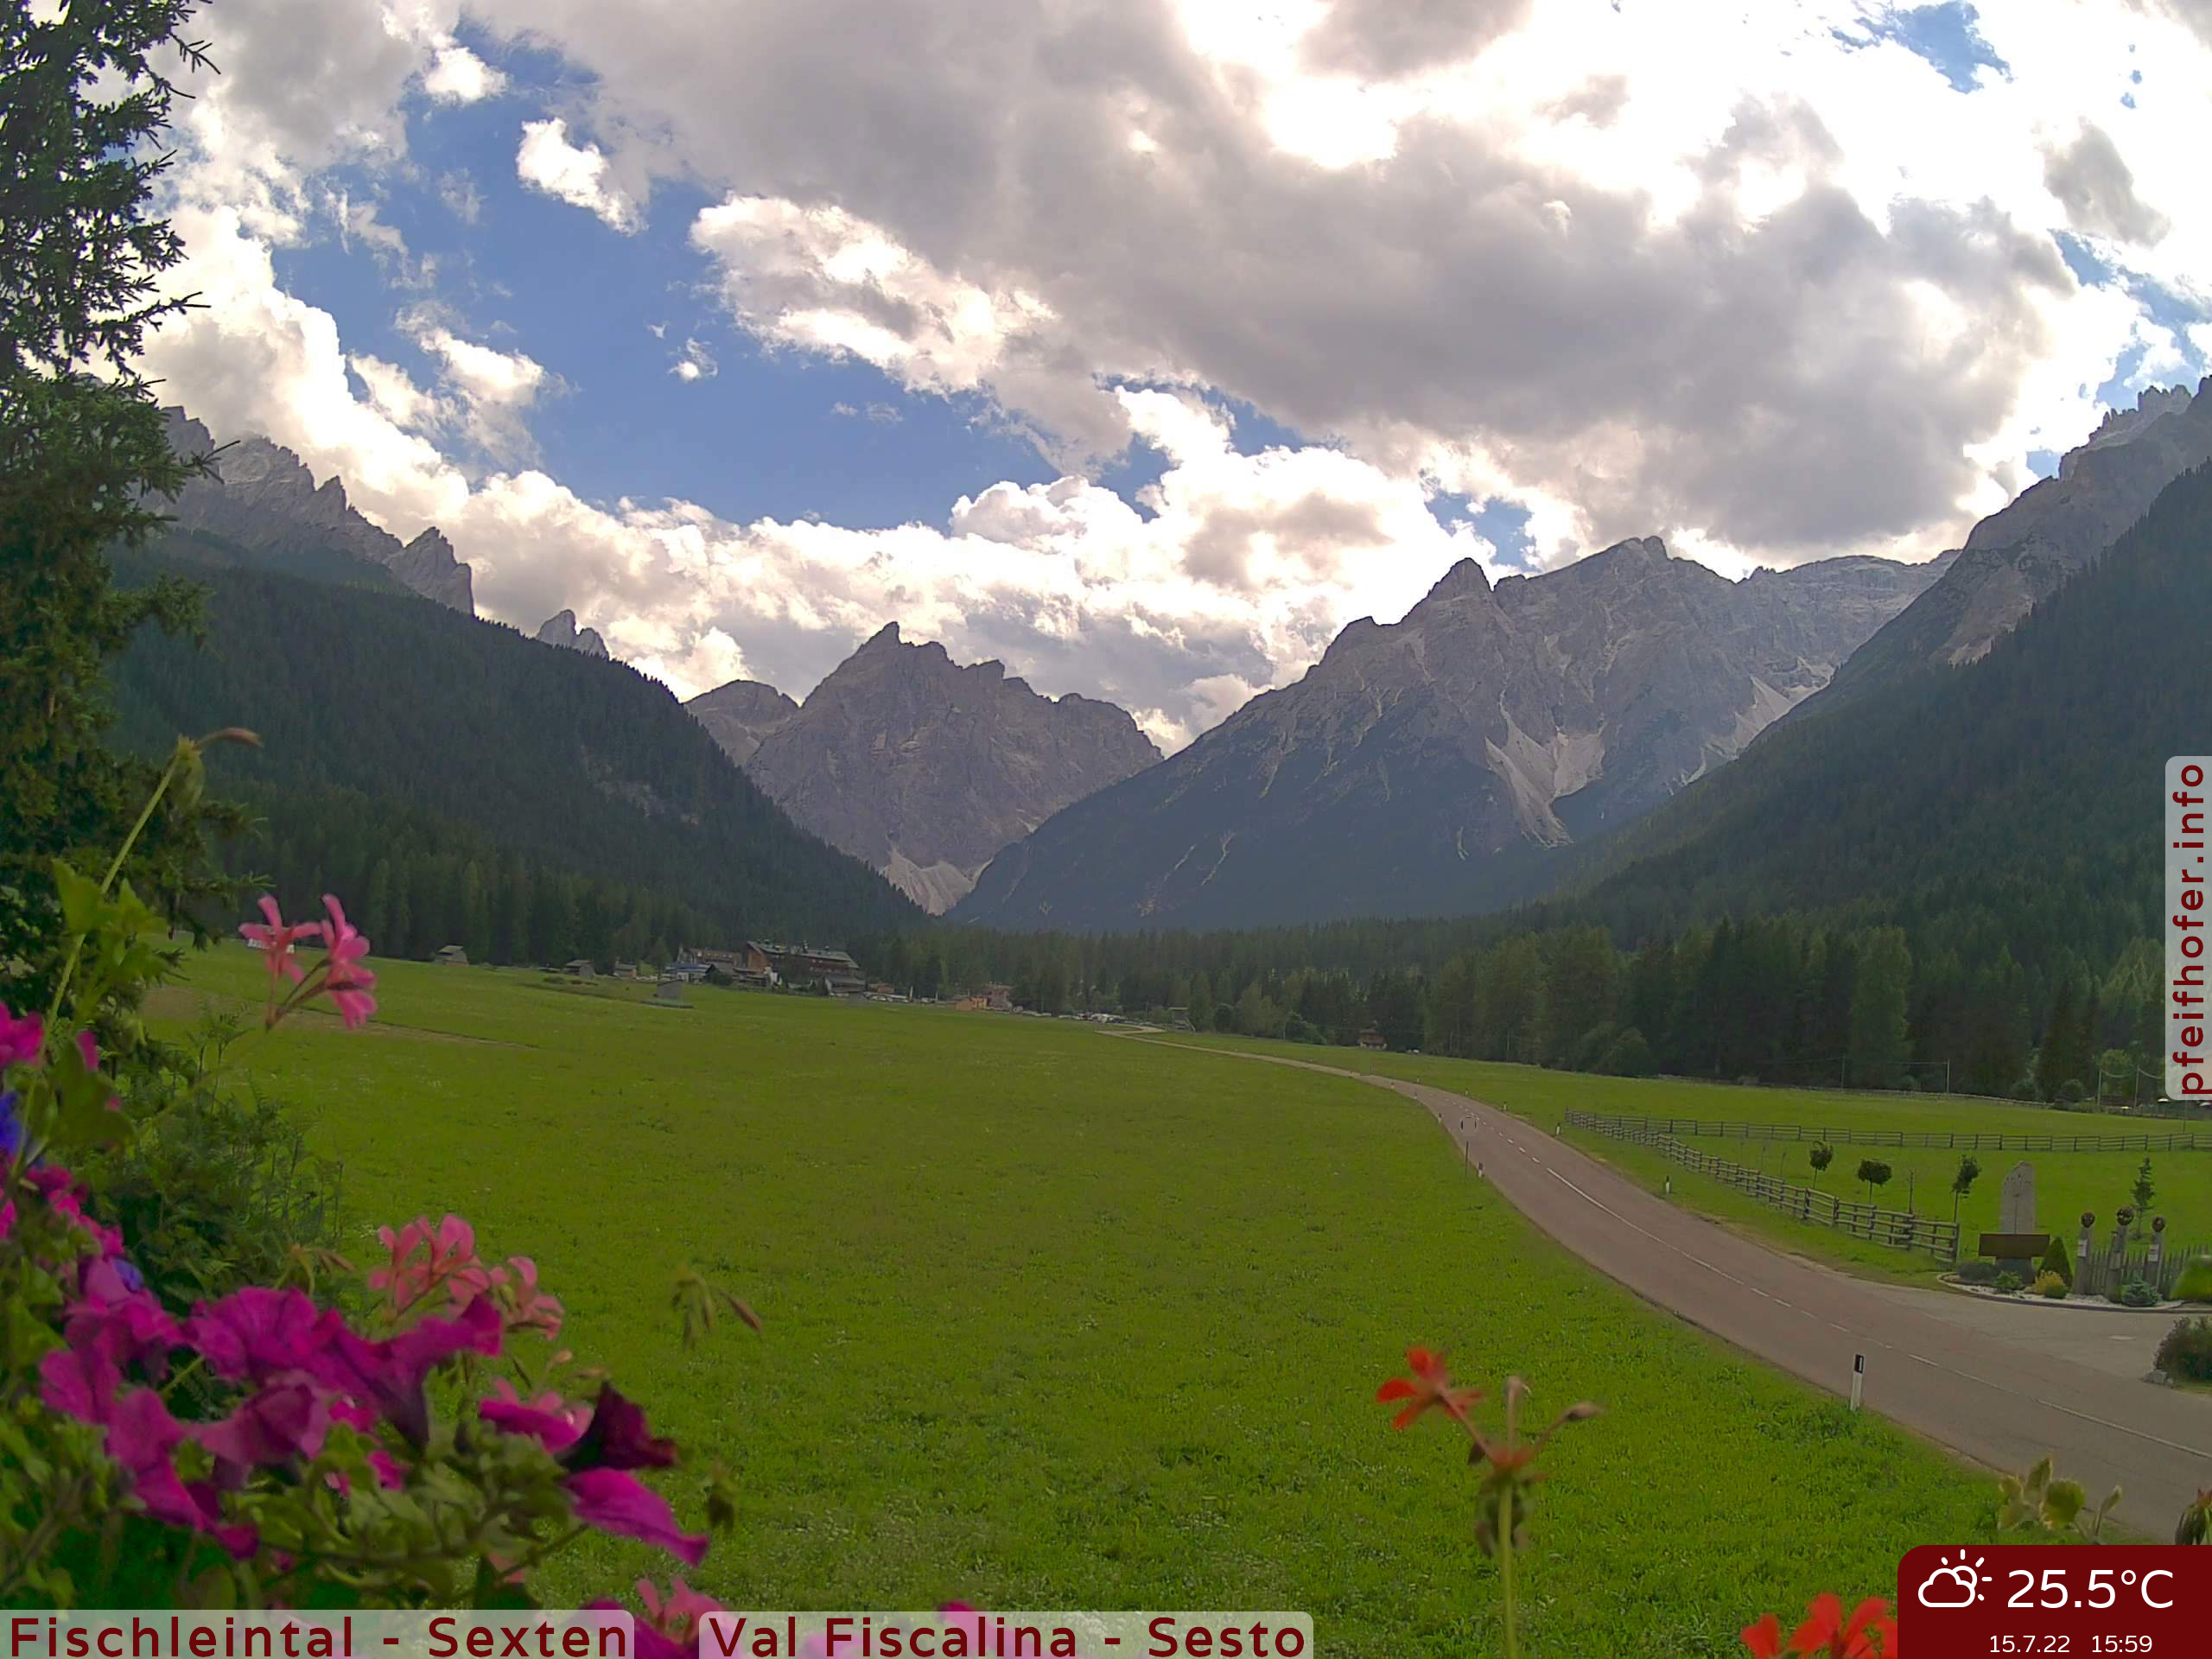 Webcam Fischleintal - Sexten - Sextner Dolomiten